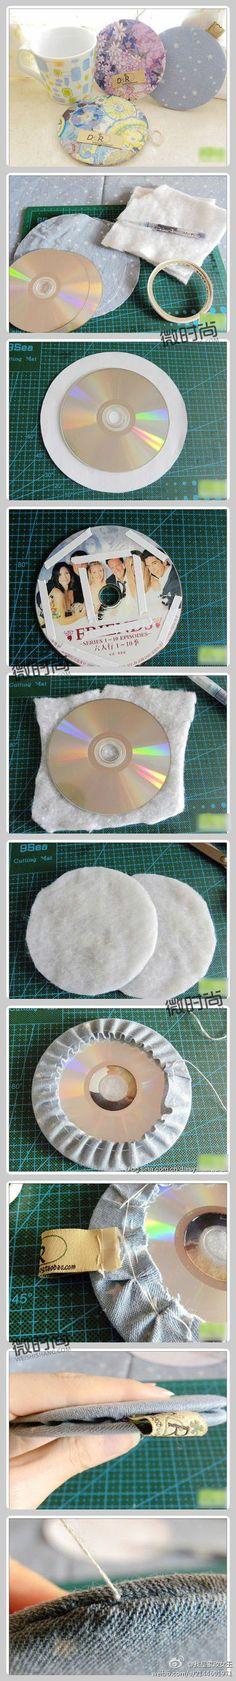 CDs recycling idea